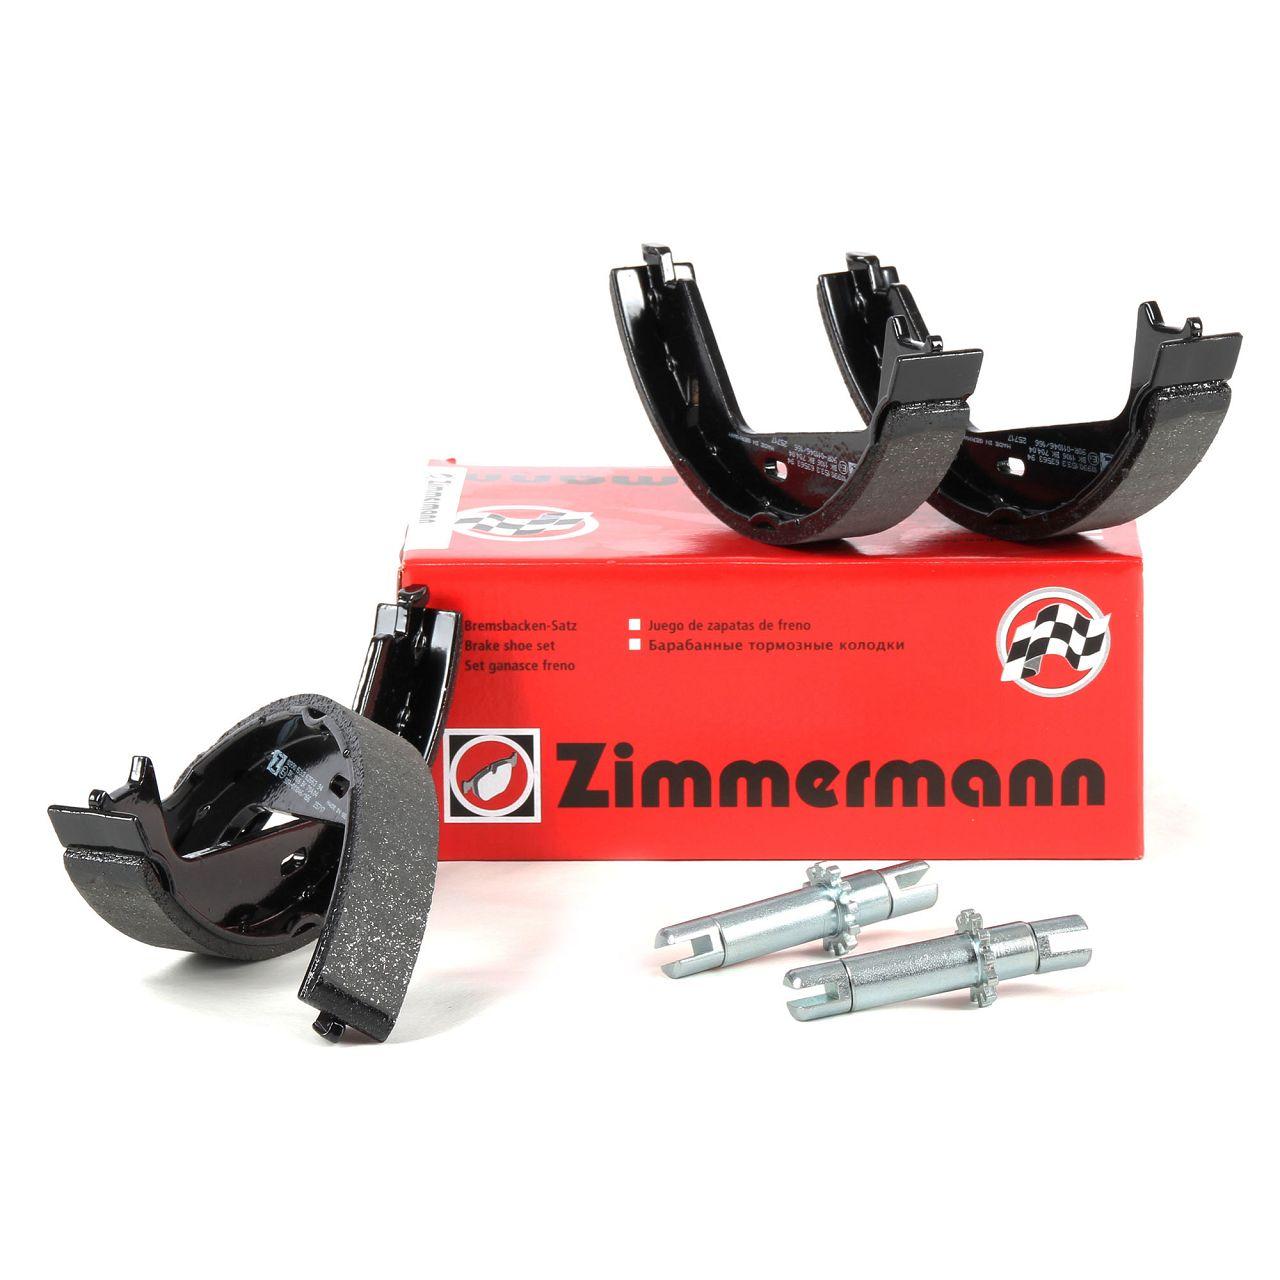 ZIMMERMANN Bremsbacken + Nachsteller Satz VOLVO S80 I V70 II XC90 XC70 Cross Country